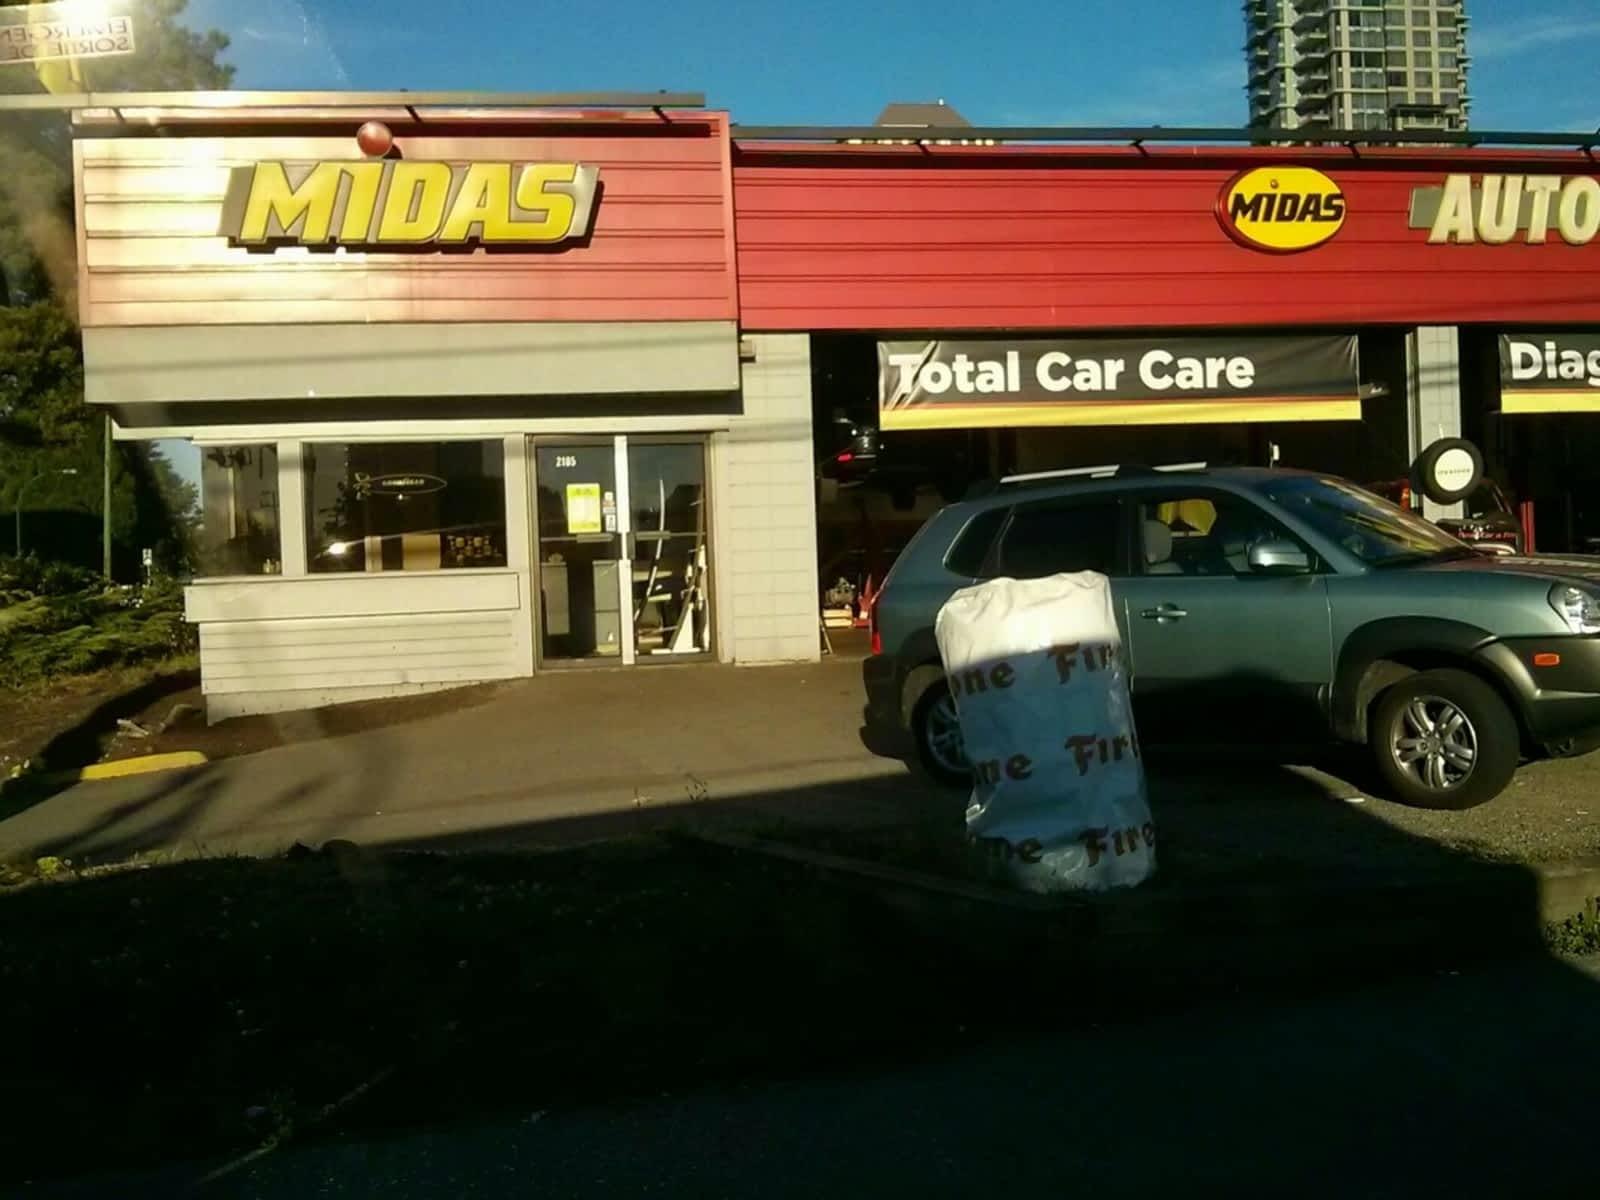 Midas Auto Service Experts - 2185 Willingdon Ave, Burnaby, BC